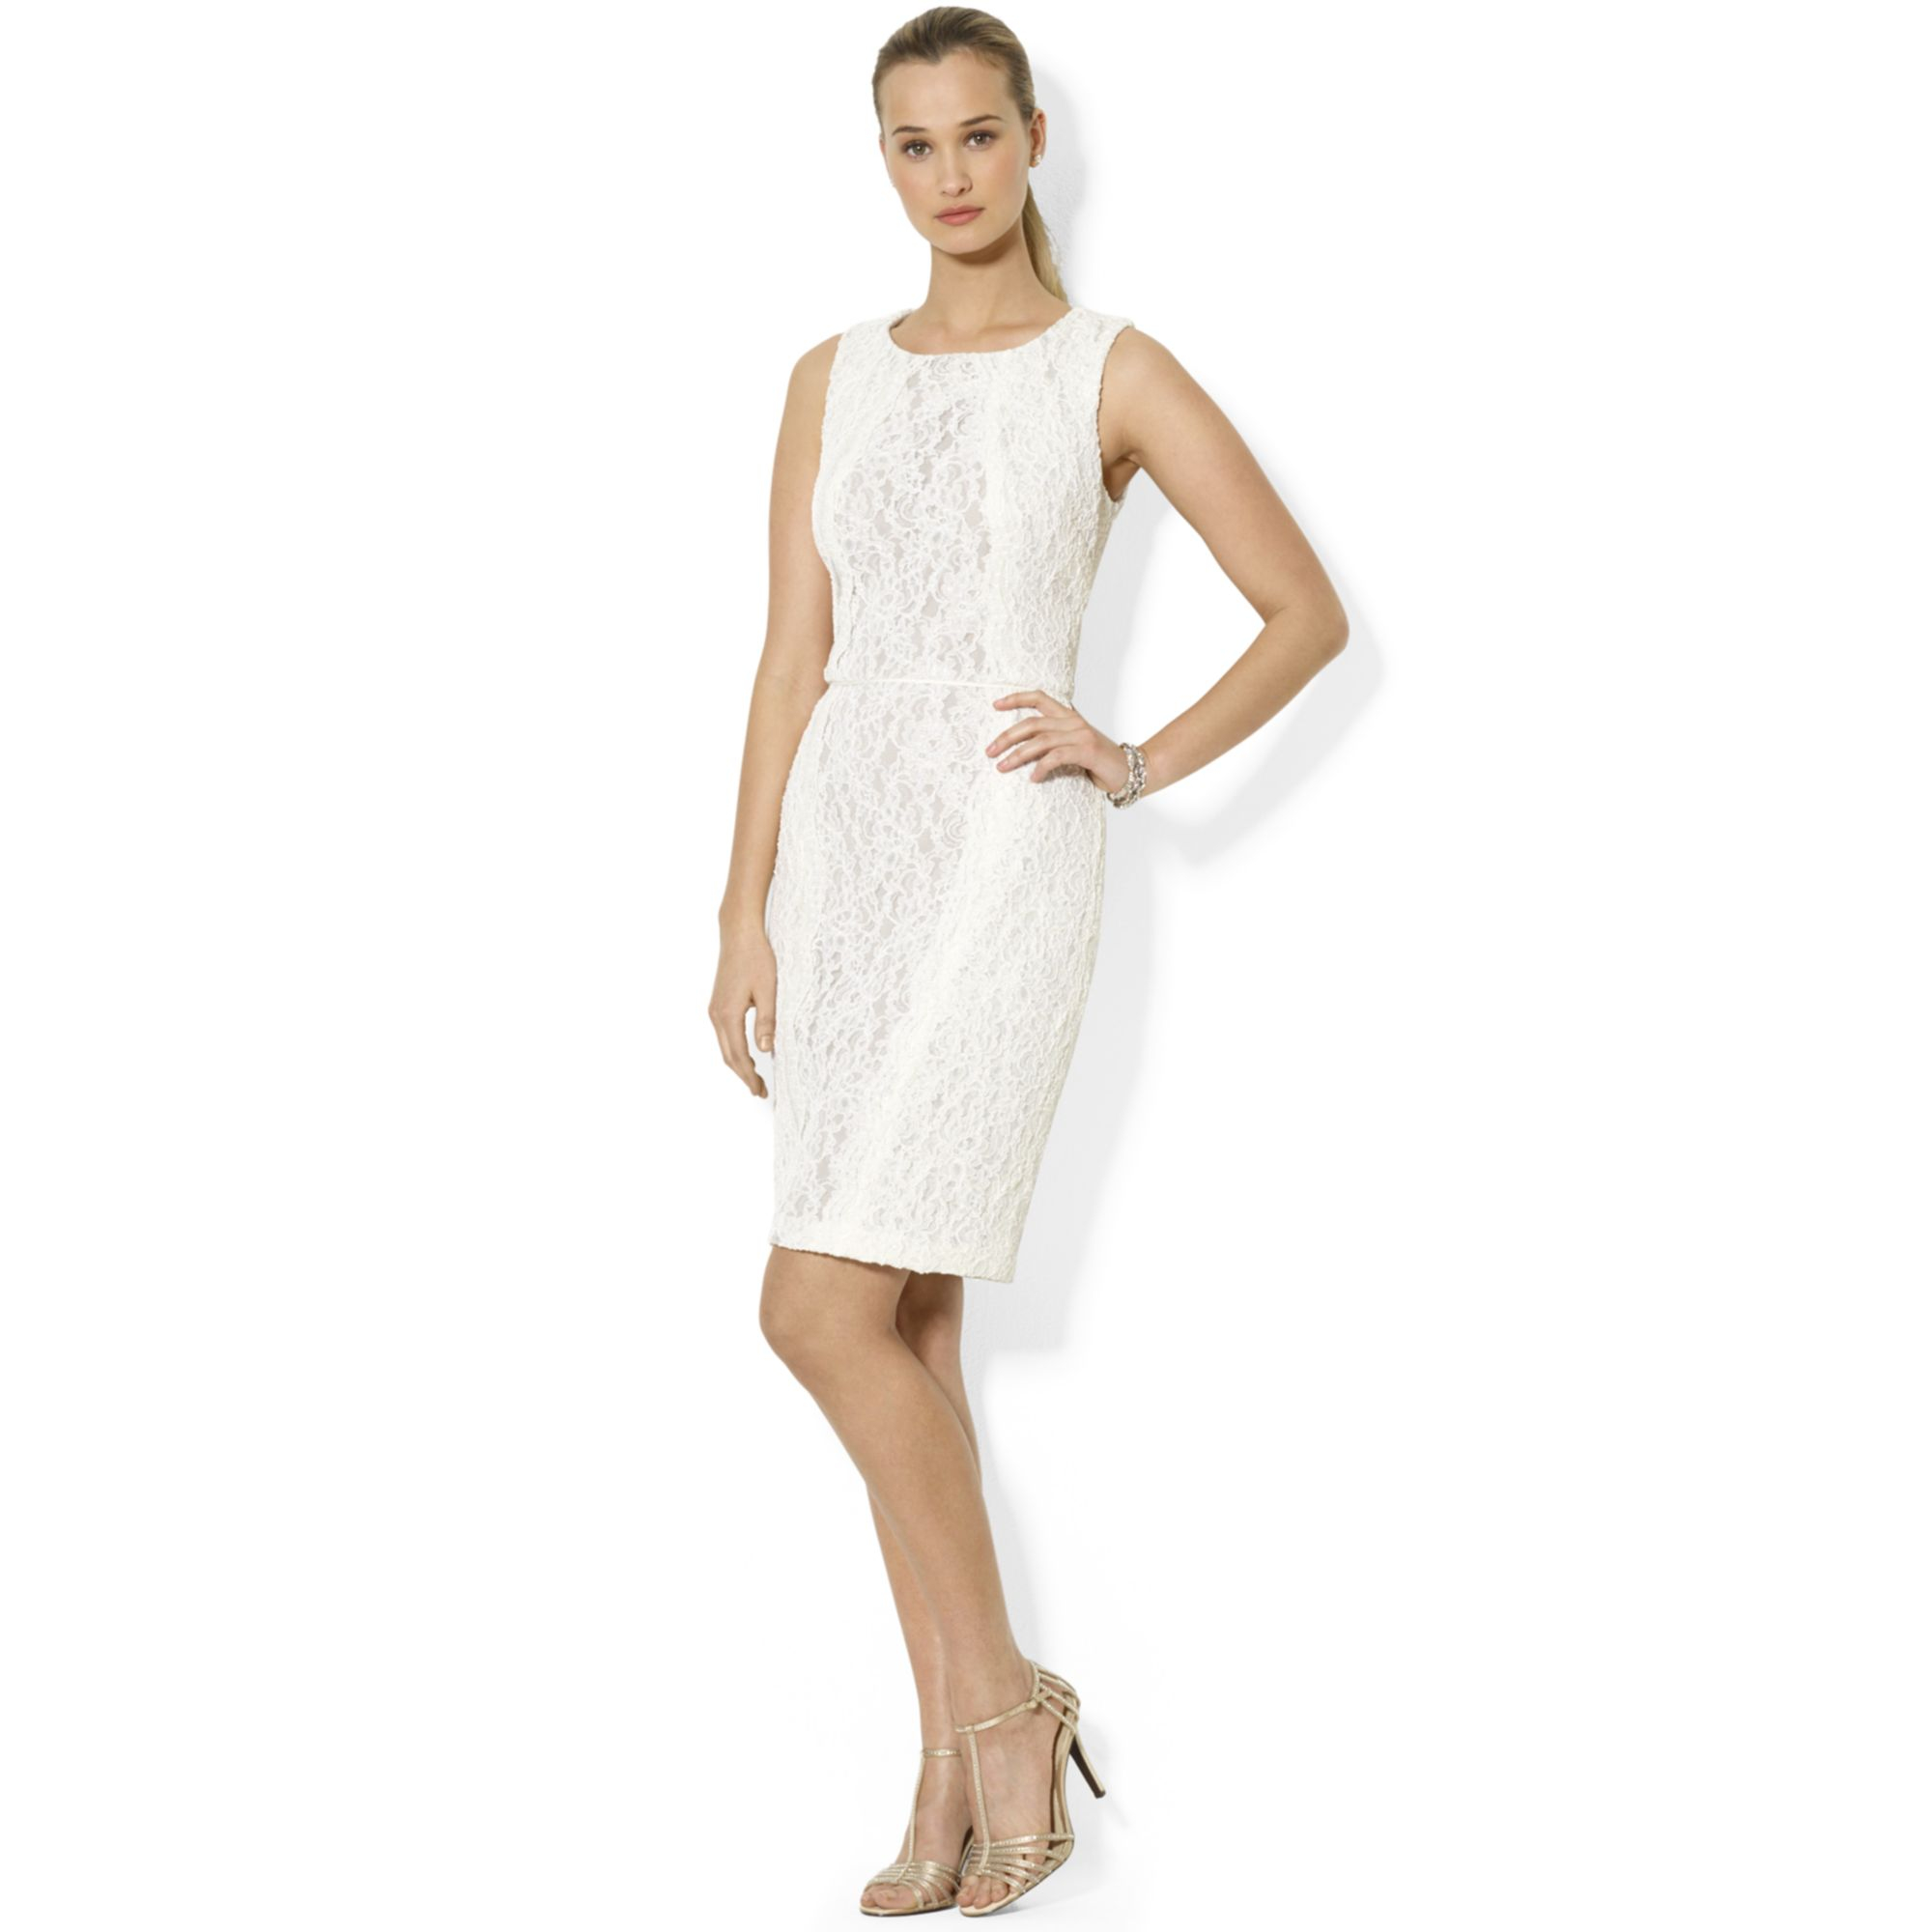 Lyst - Lauren By Ralph Lauren Sleeveless Lace Dress in White